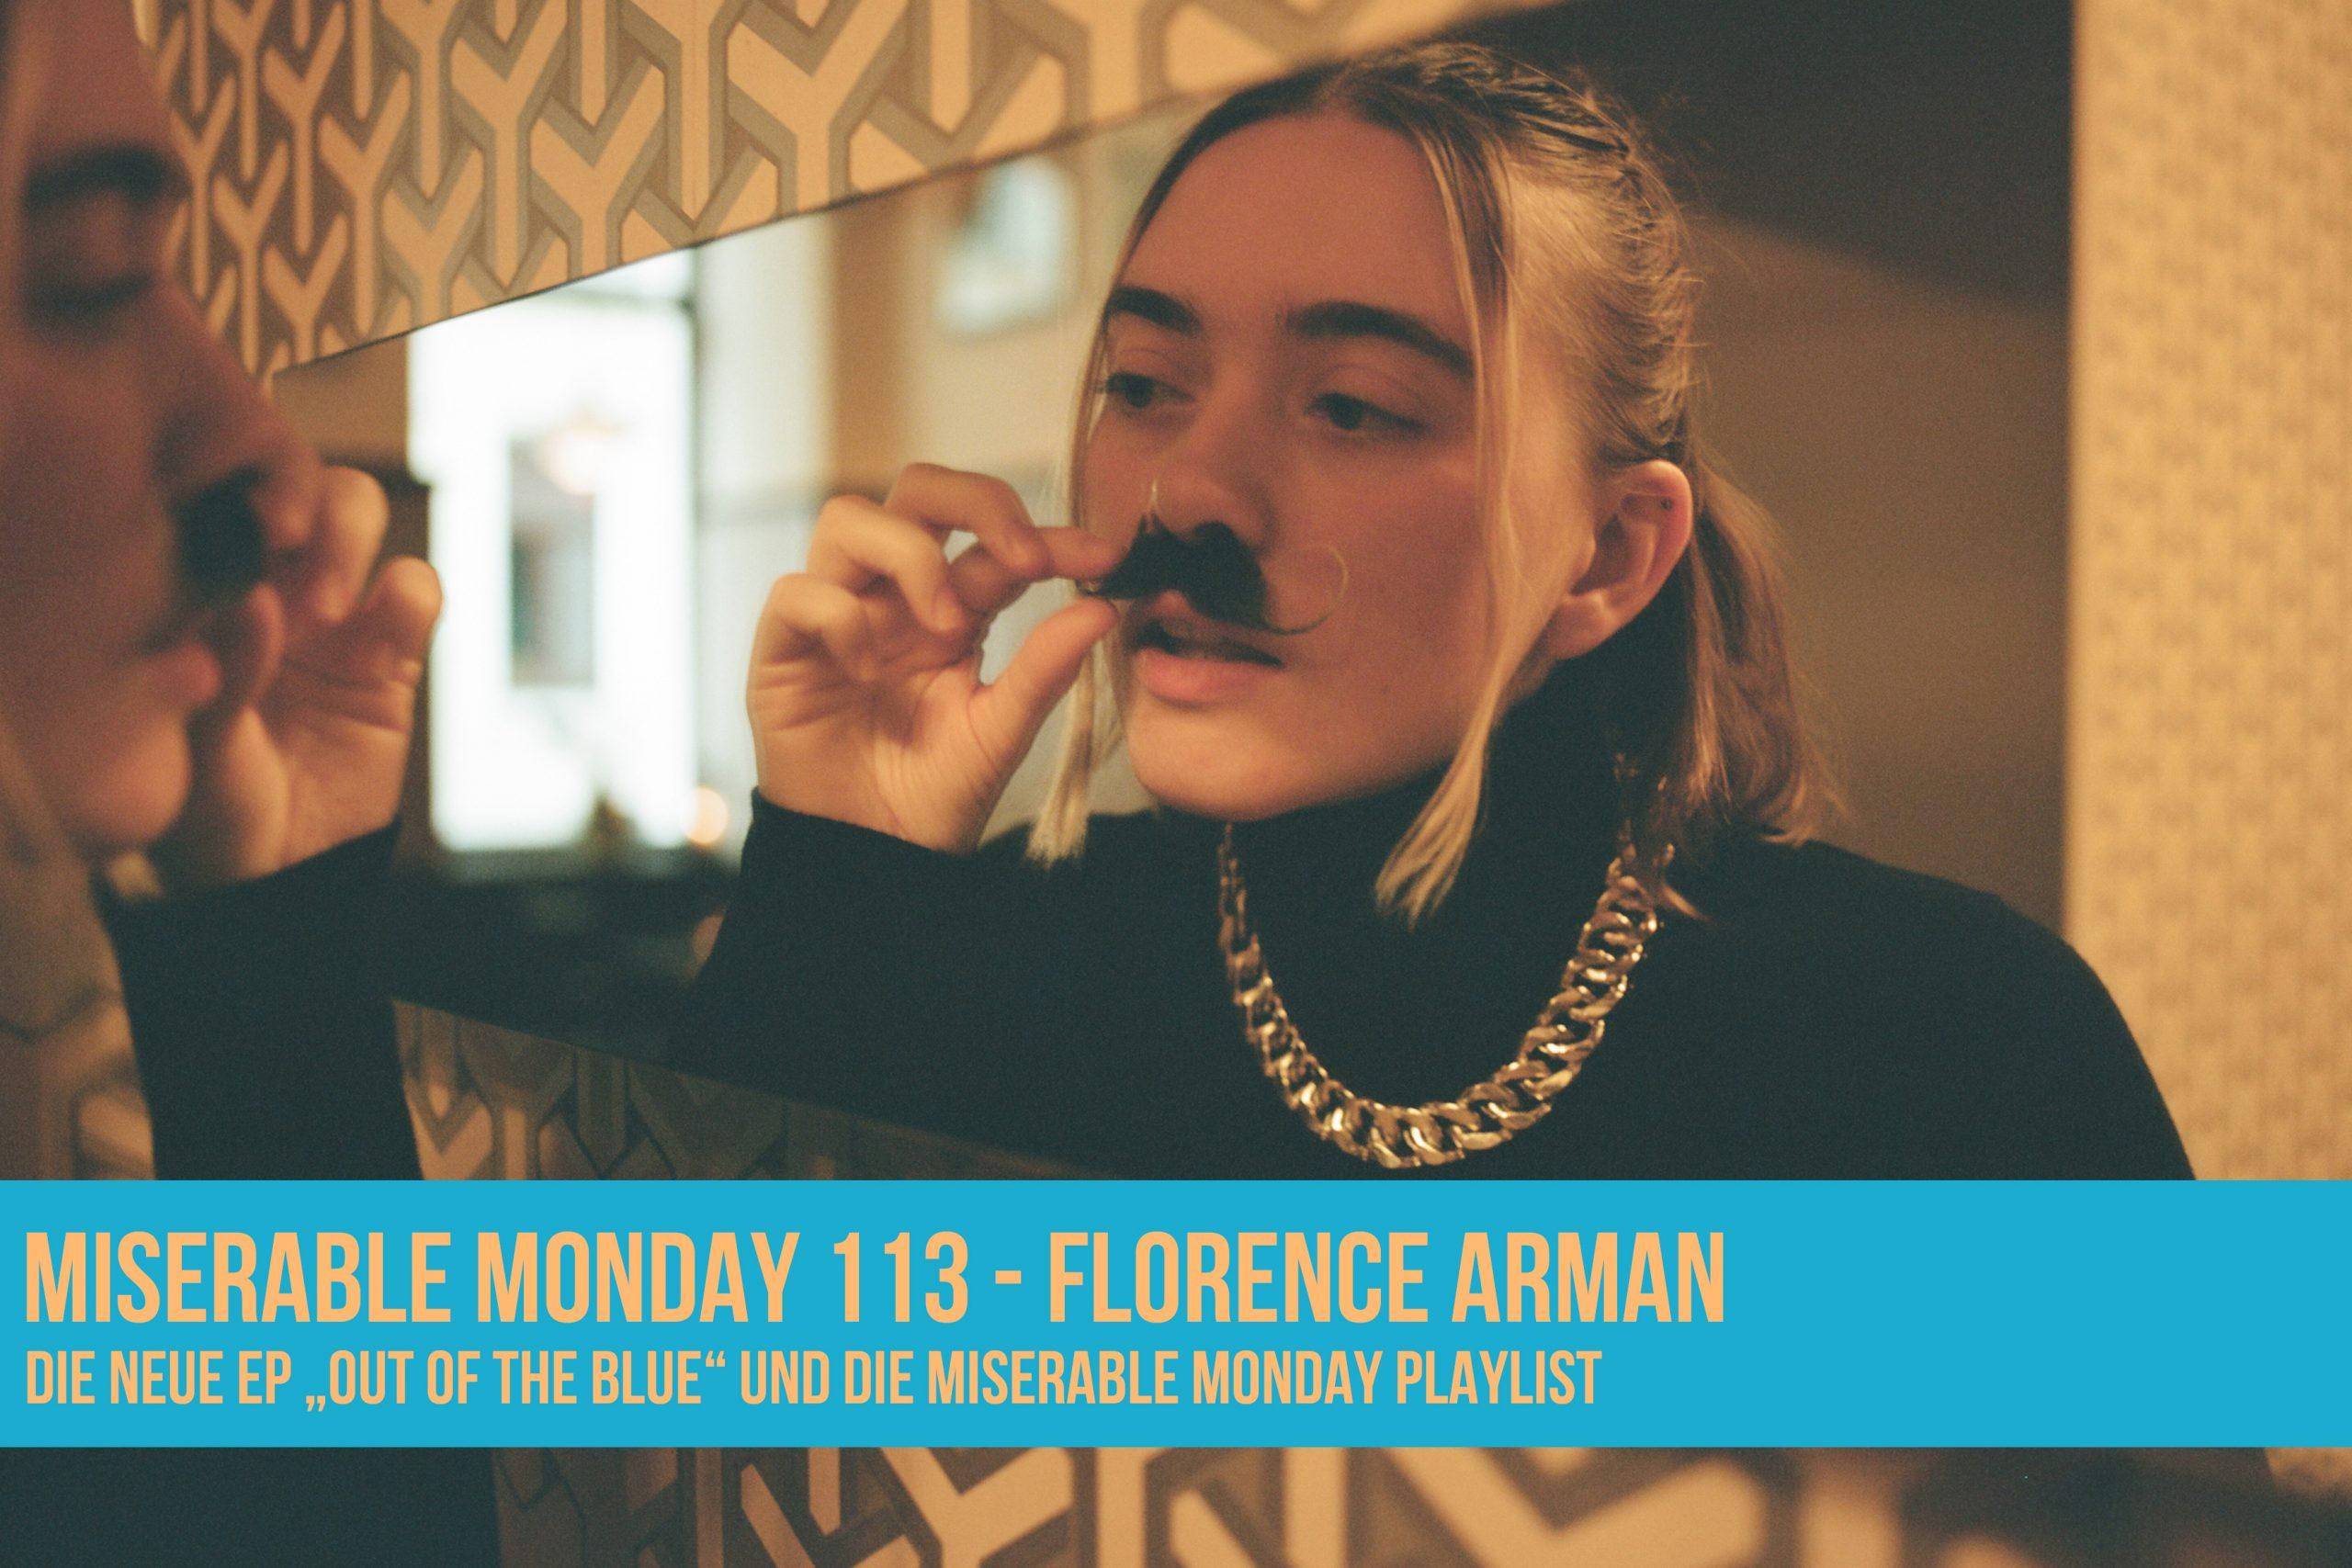 Florence Arman, Credit: Flo Moshammer